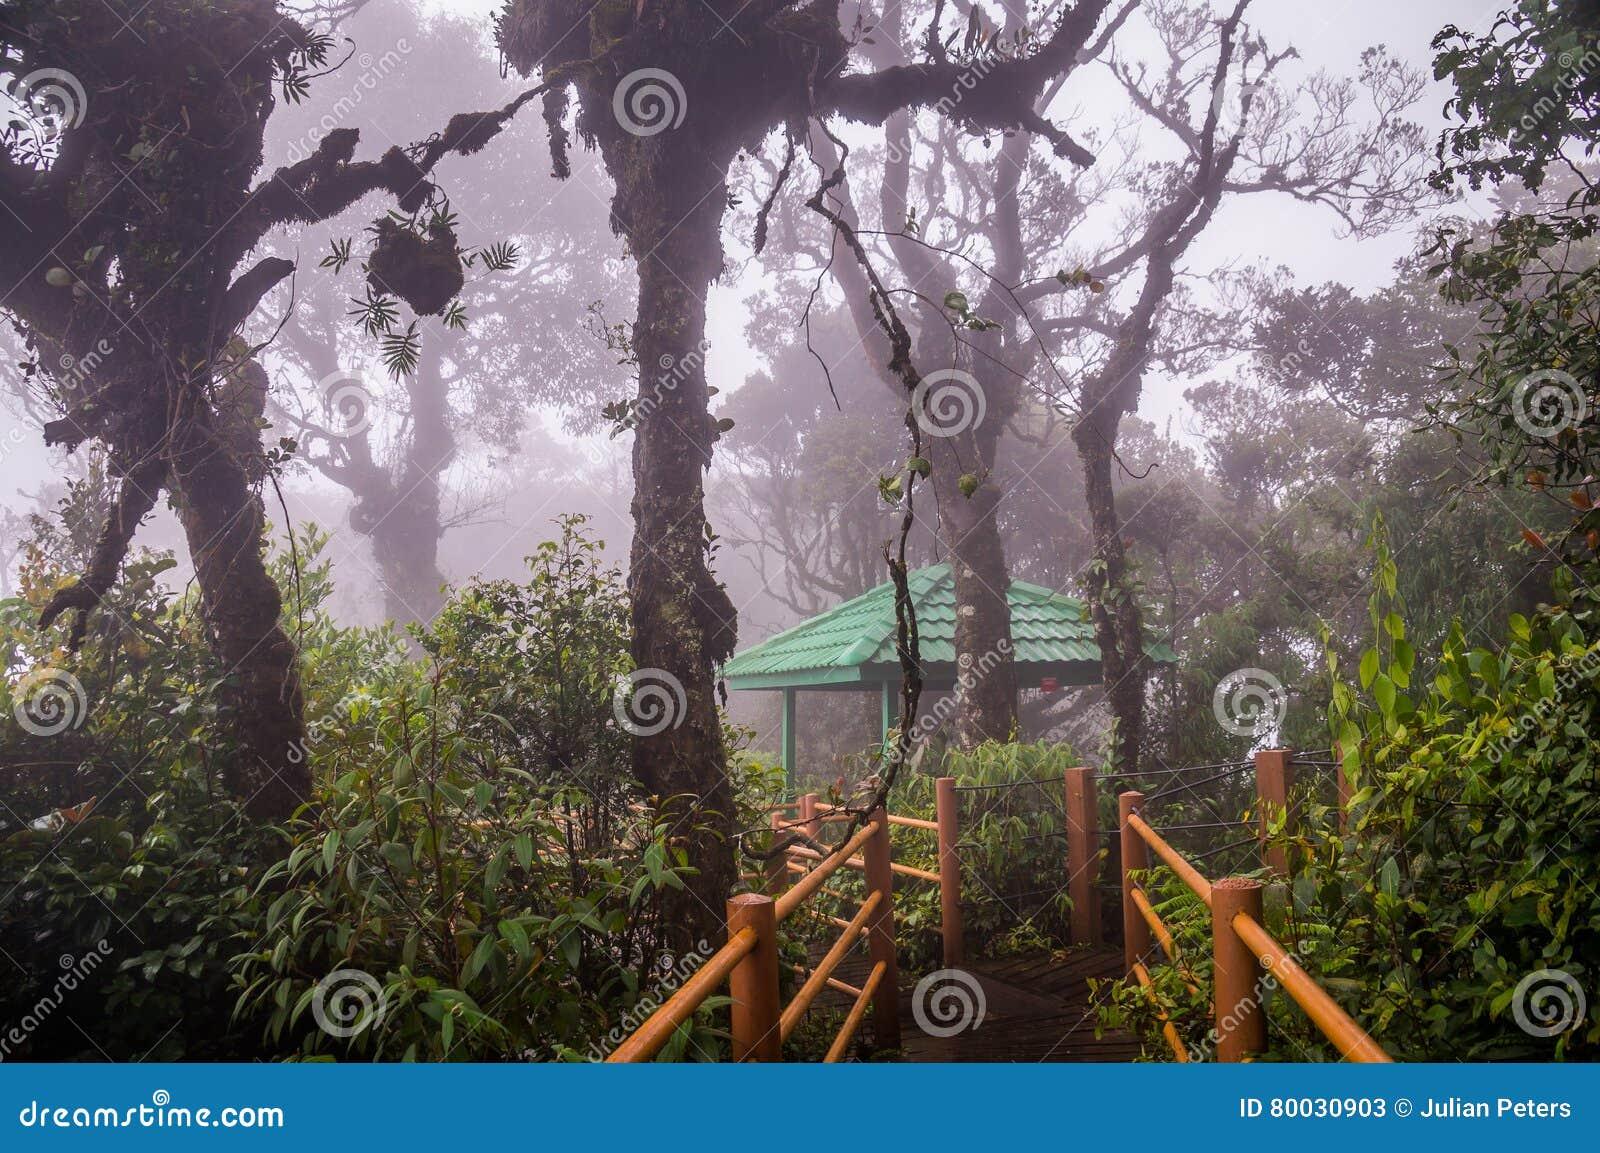 Boardwalk through misty Mossy Forest in Cameron Highlands